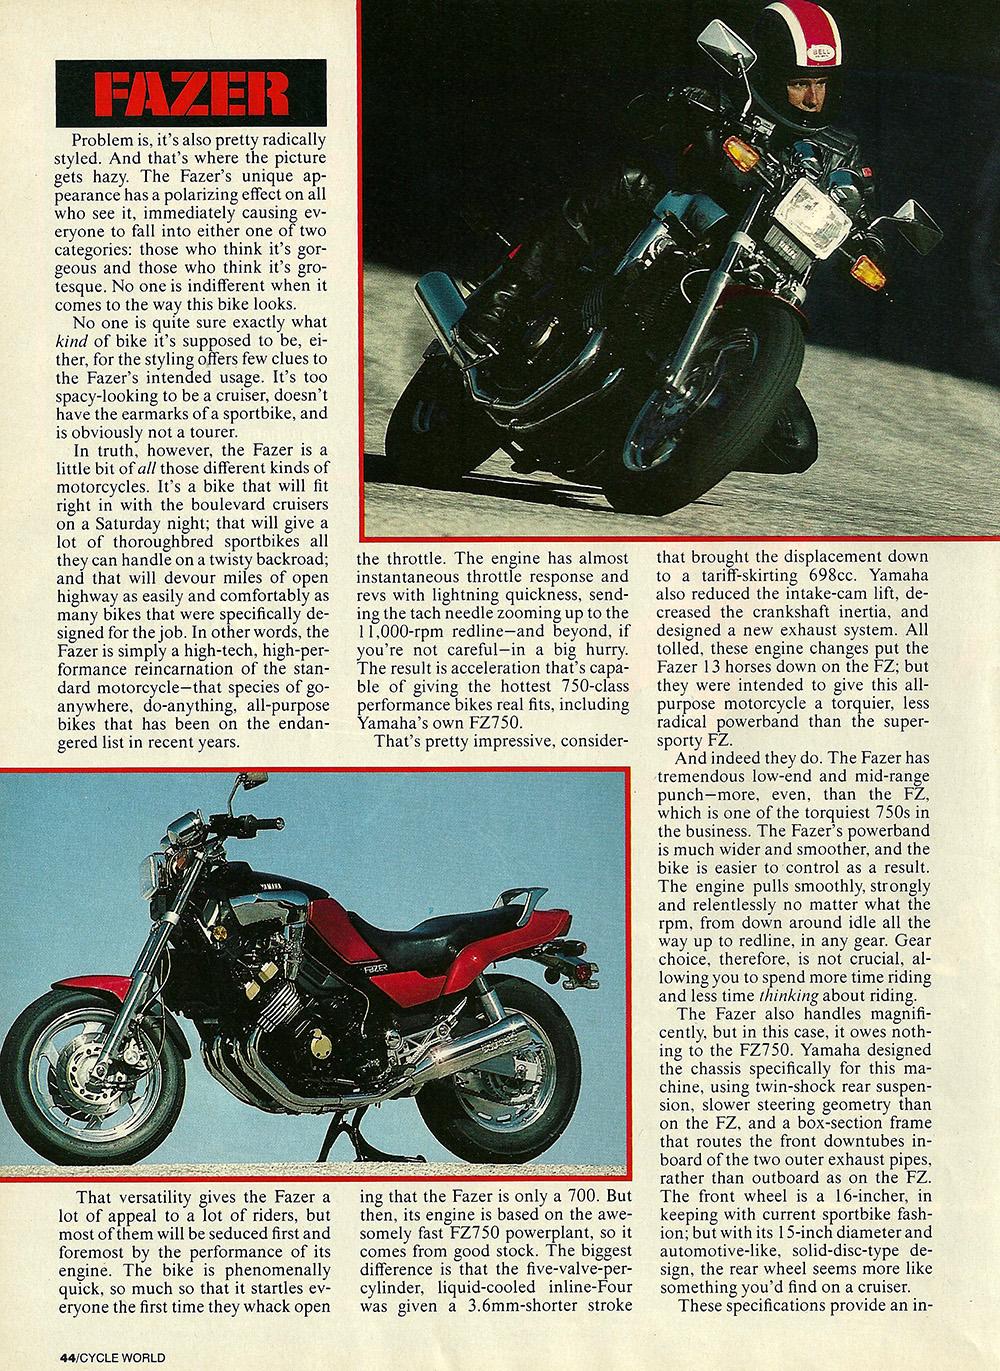 1986 Yamaha Fazer FZX700 road test 03.jpg